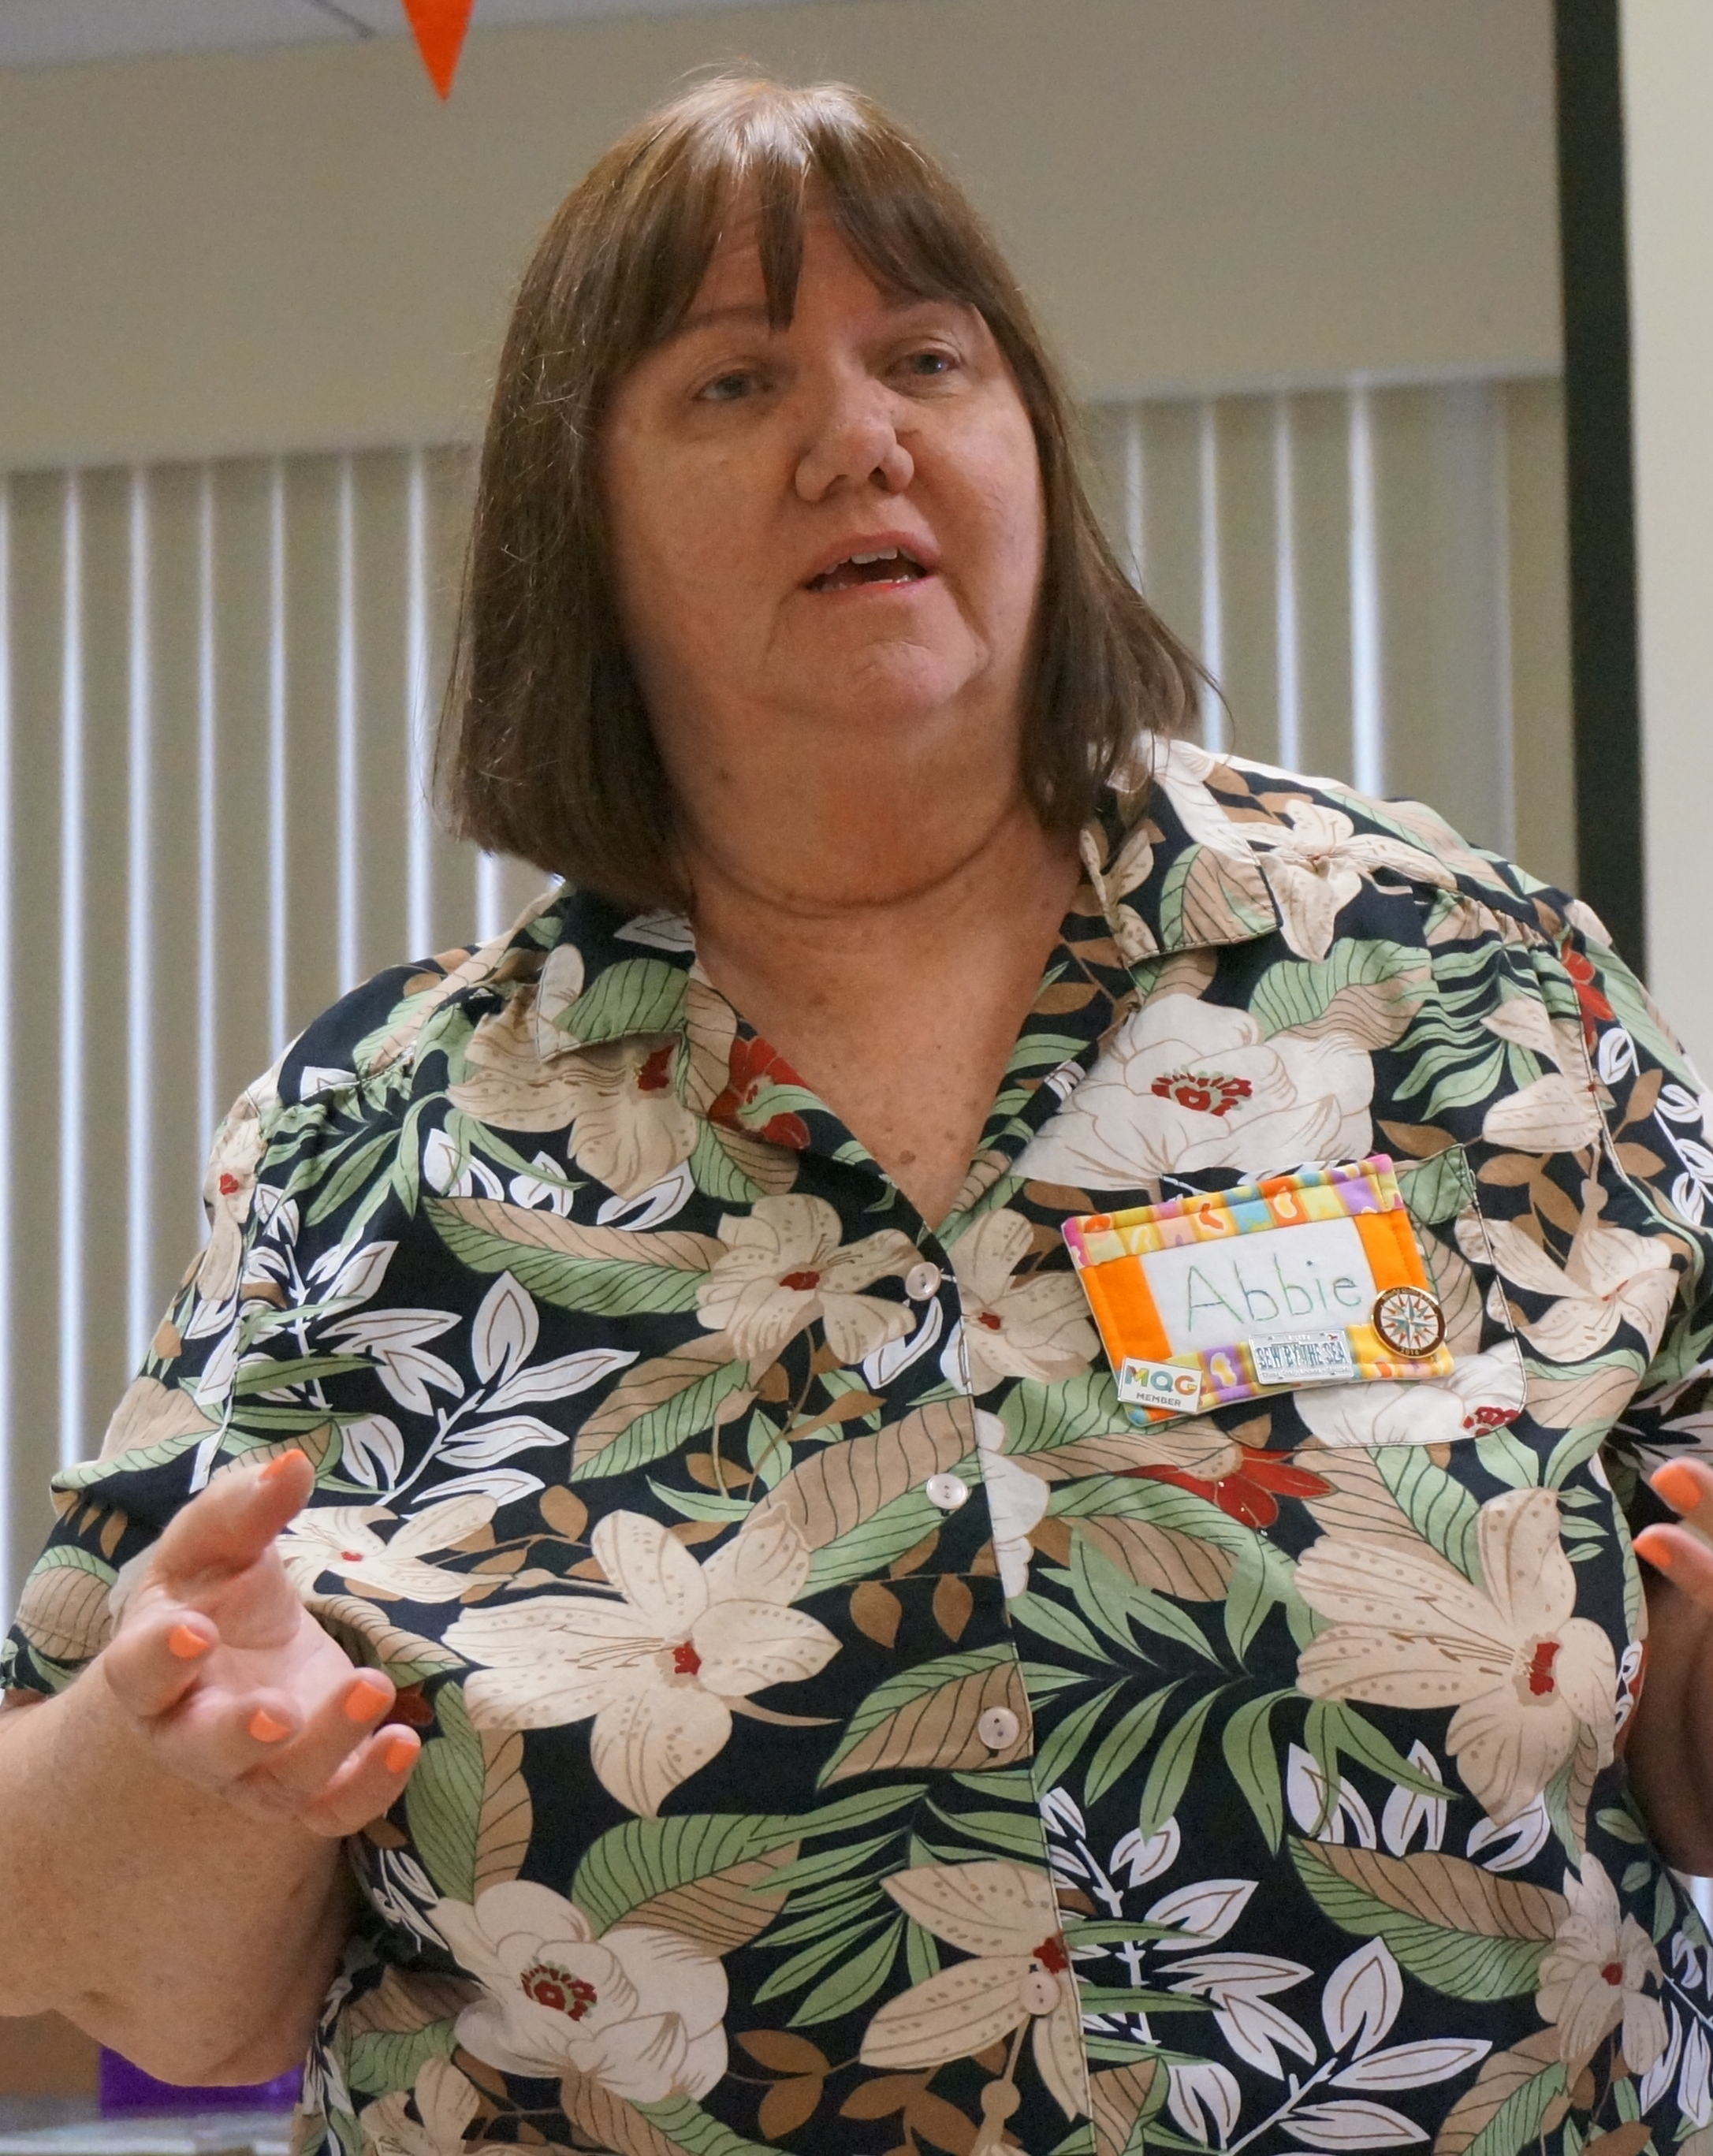 Outgoing Treasurer Abbie Bill makes an introduction